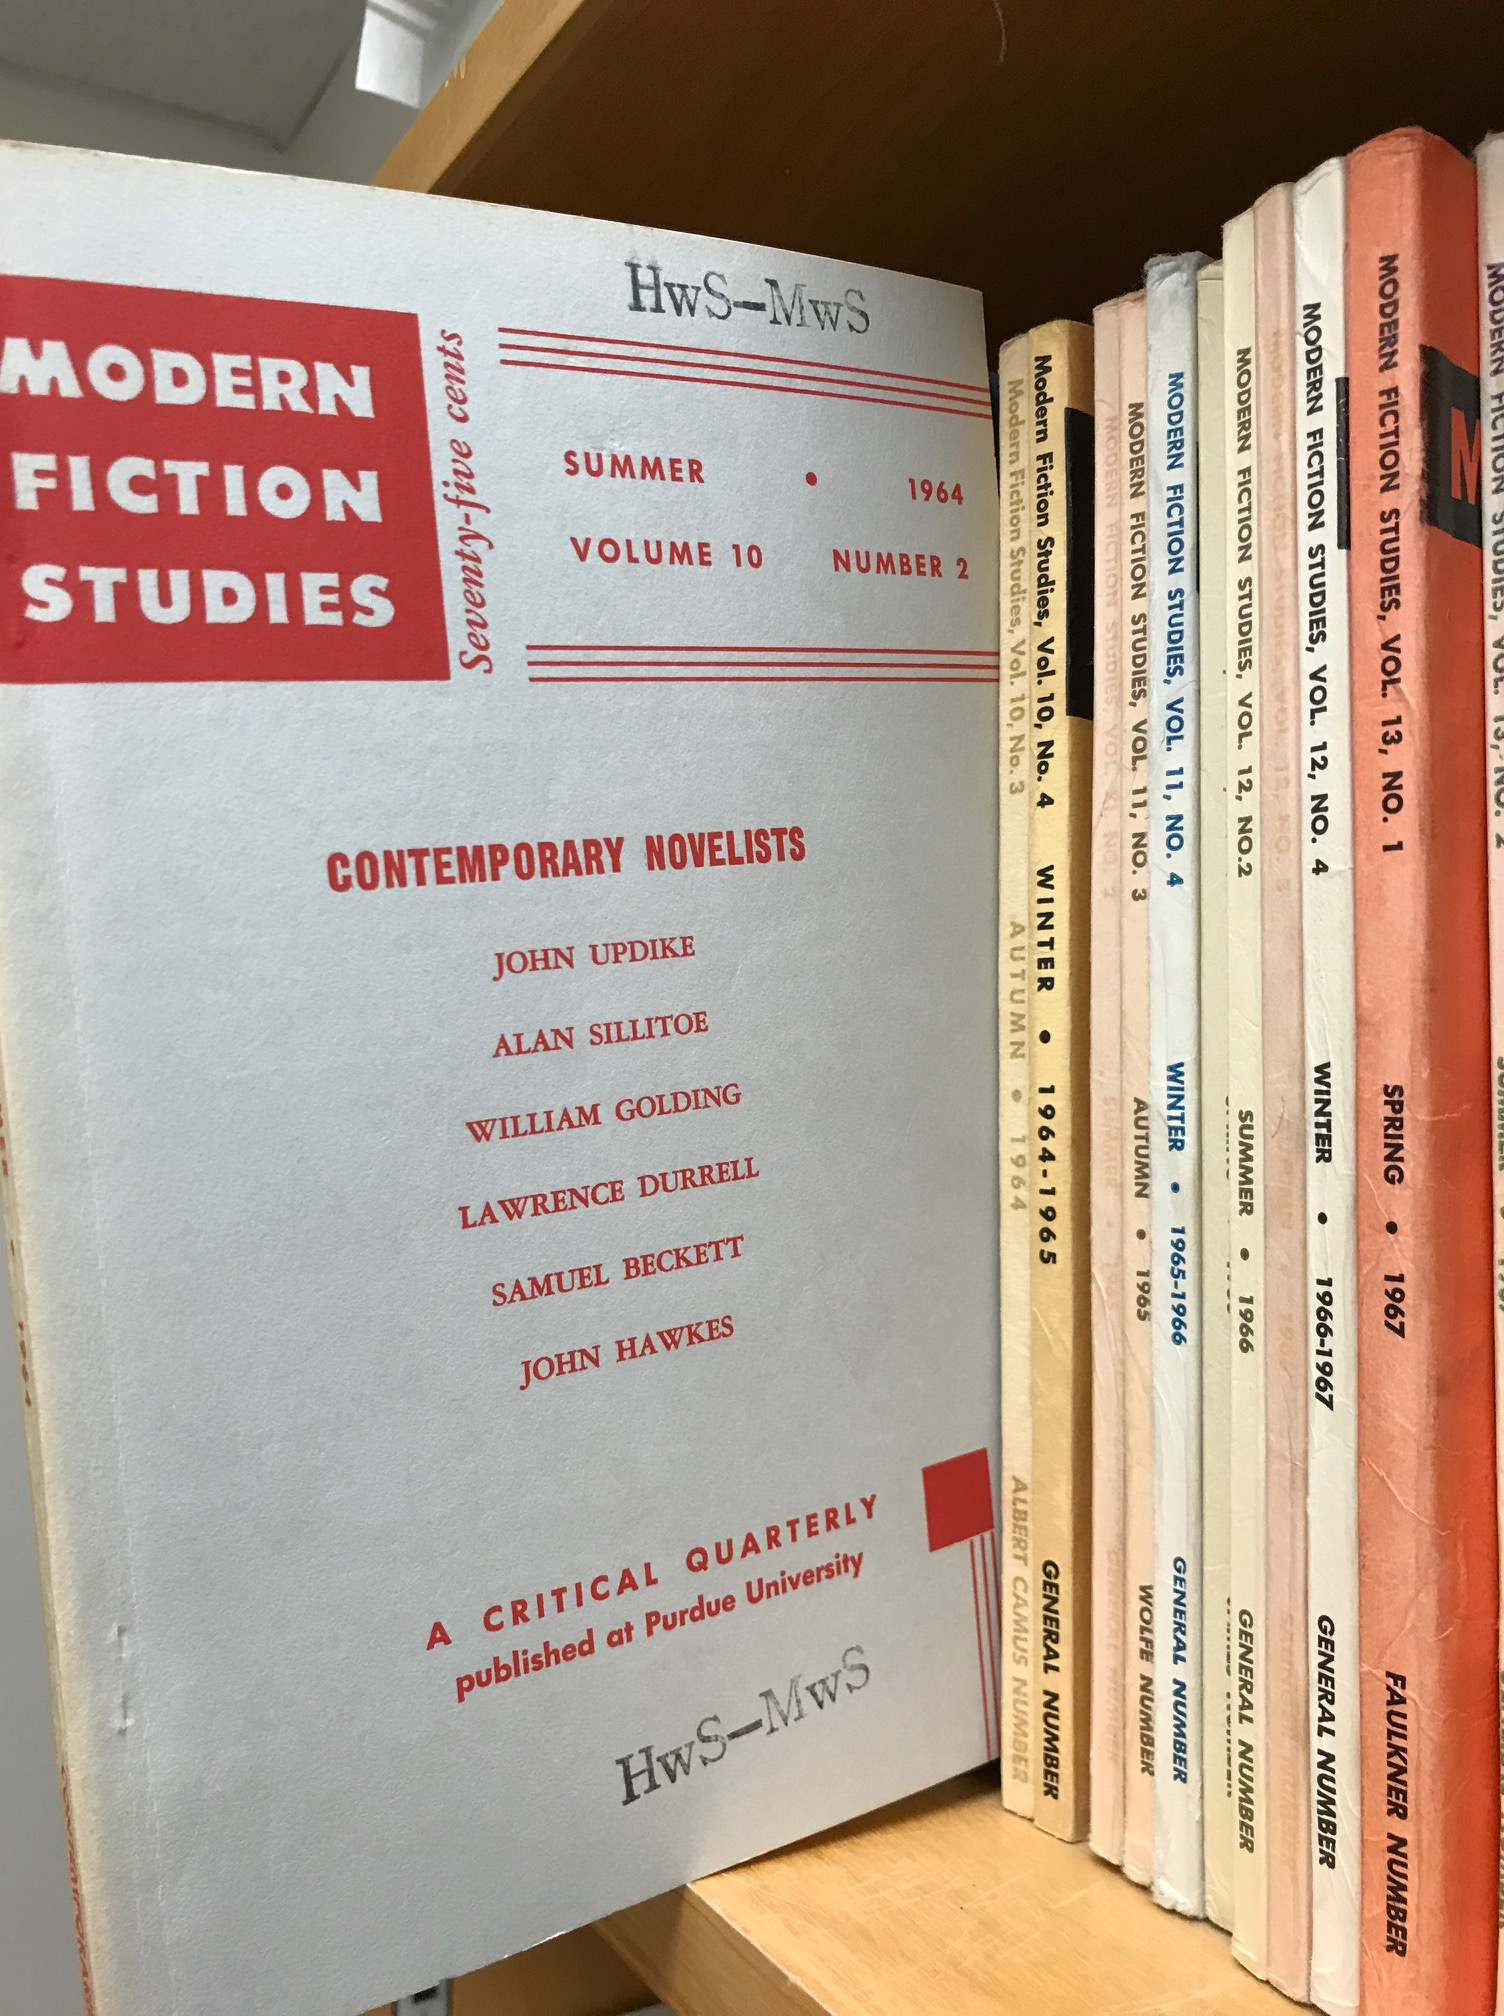 ls_journals_modern_fiction_studies_cover